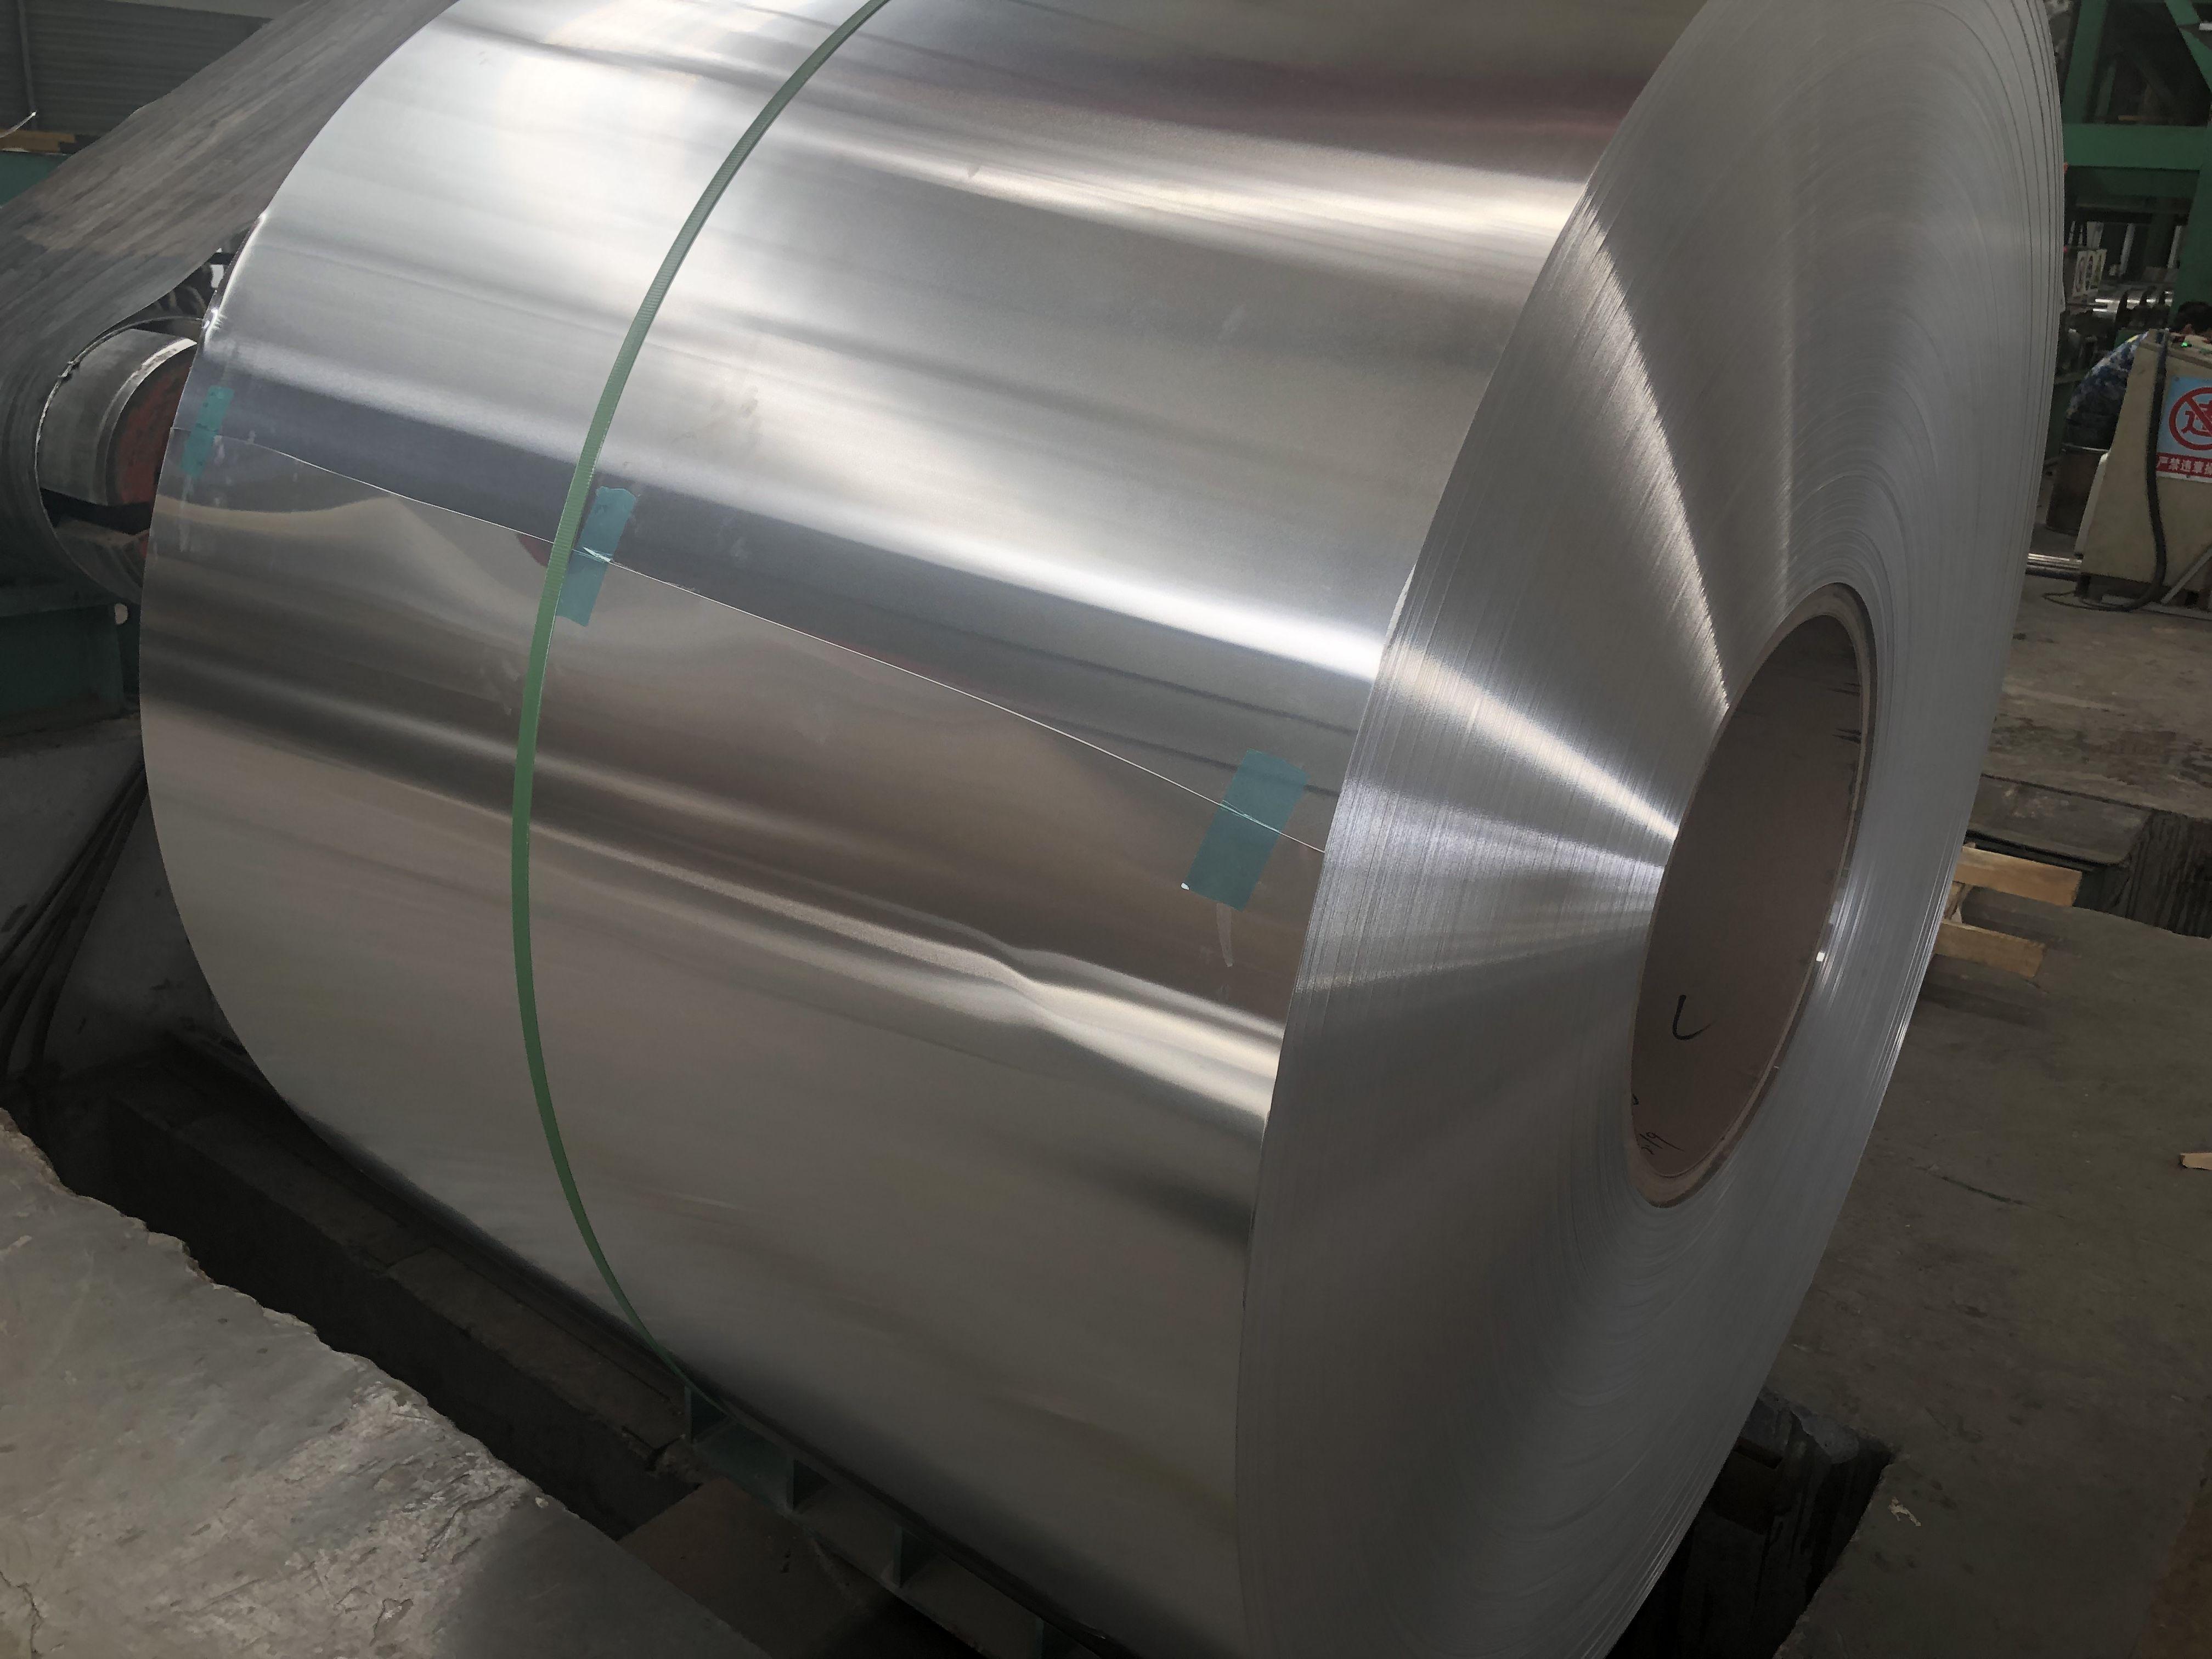 Raw Material Plain Aluminium Kenya Bauxite Produce Speed 50 60m Min Painting Technology 4 Roller 1series 3series 5series 8se Wall Cladding Cladding Bauxite